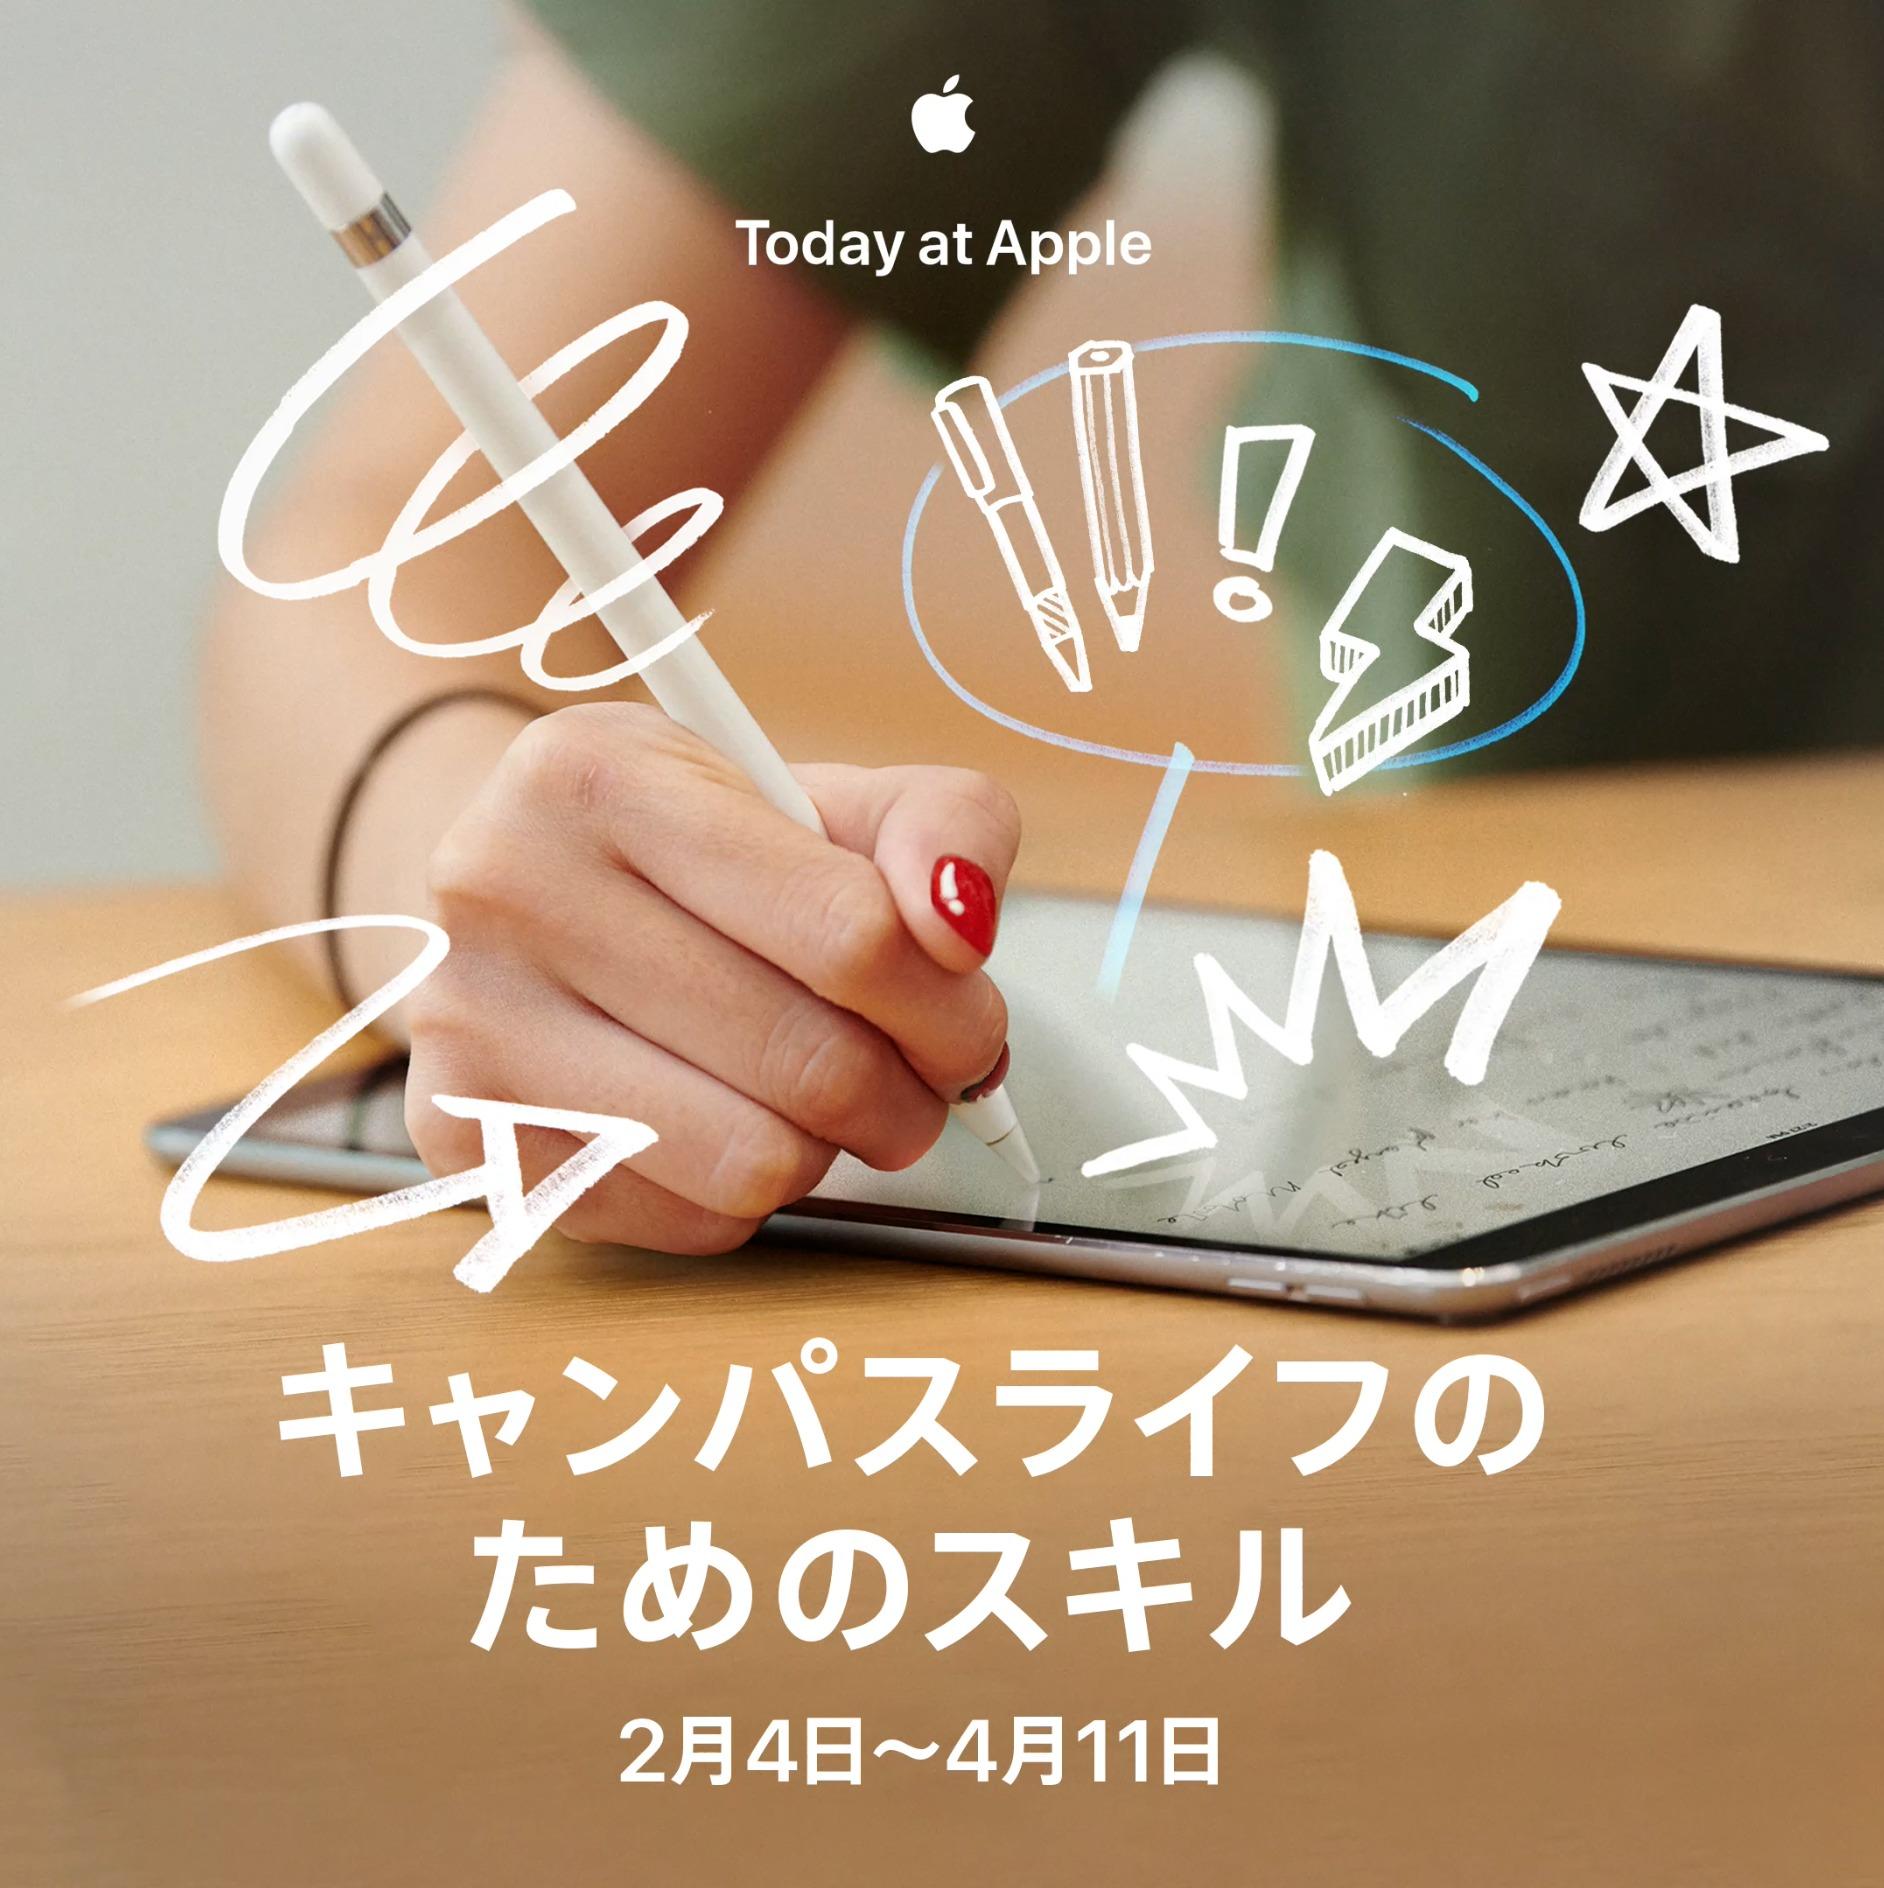 Apple公式 Today at Appleに出演します